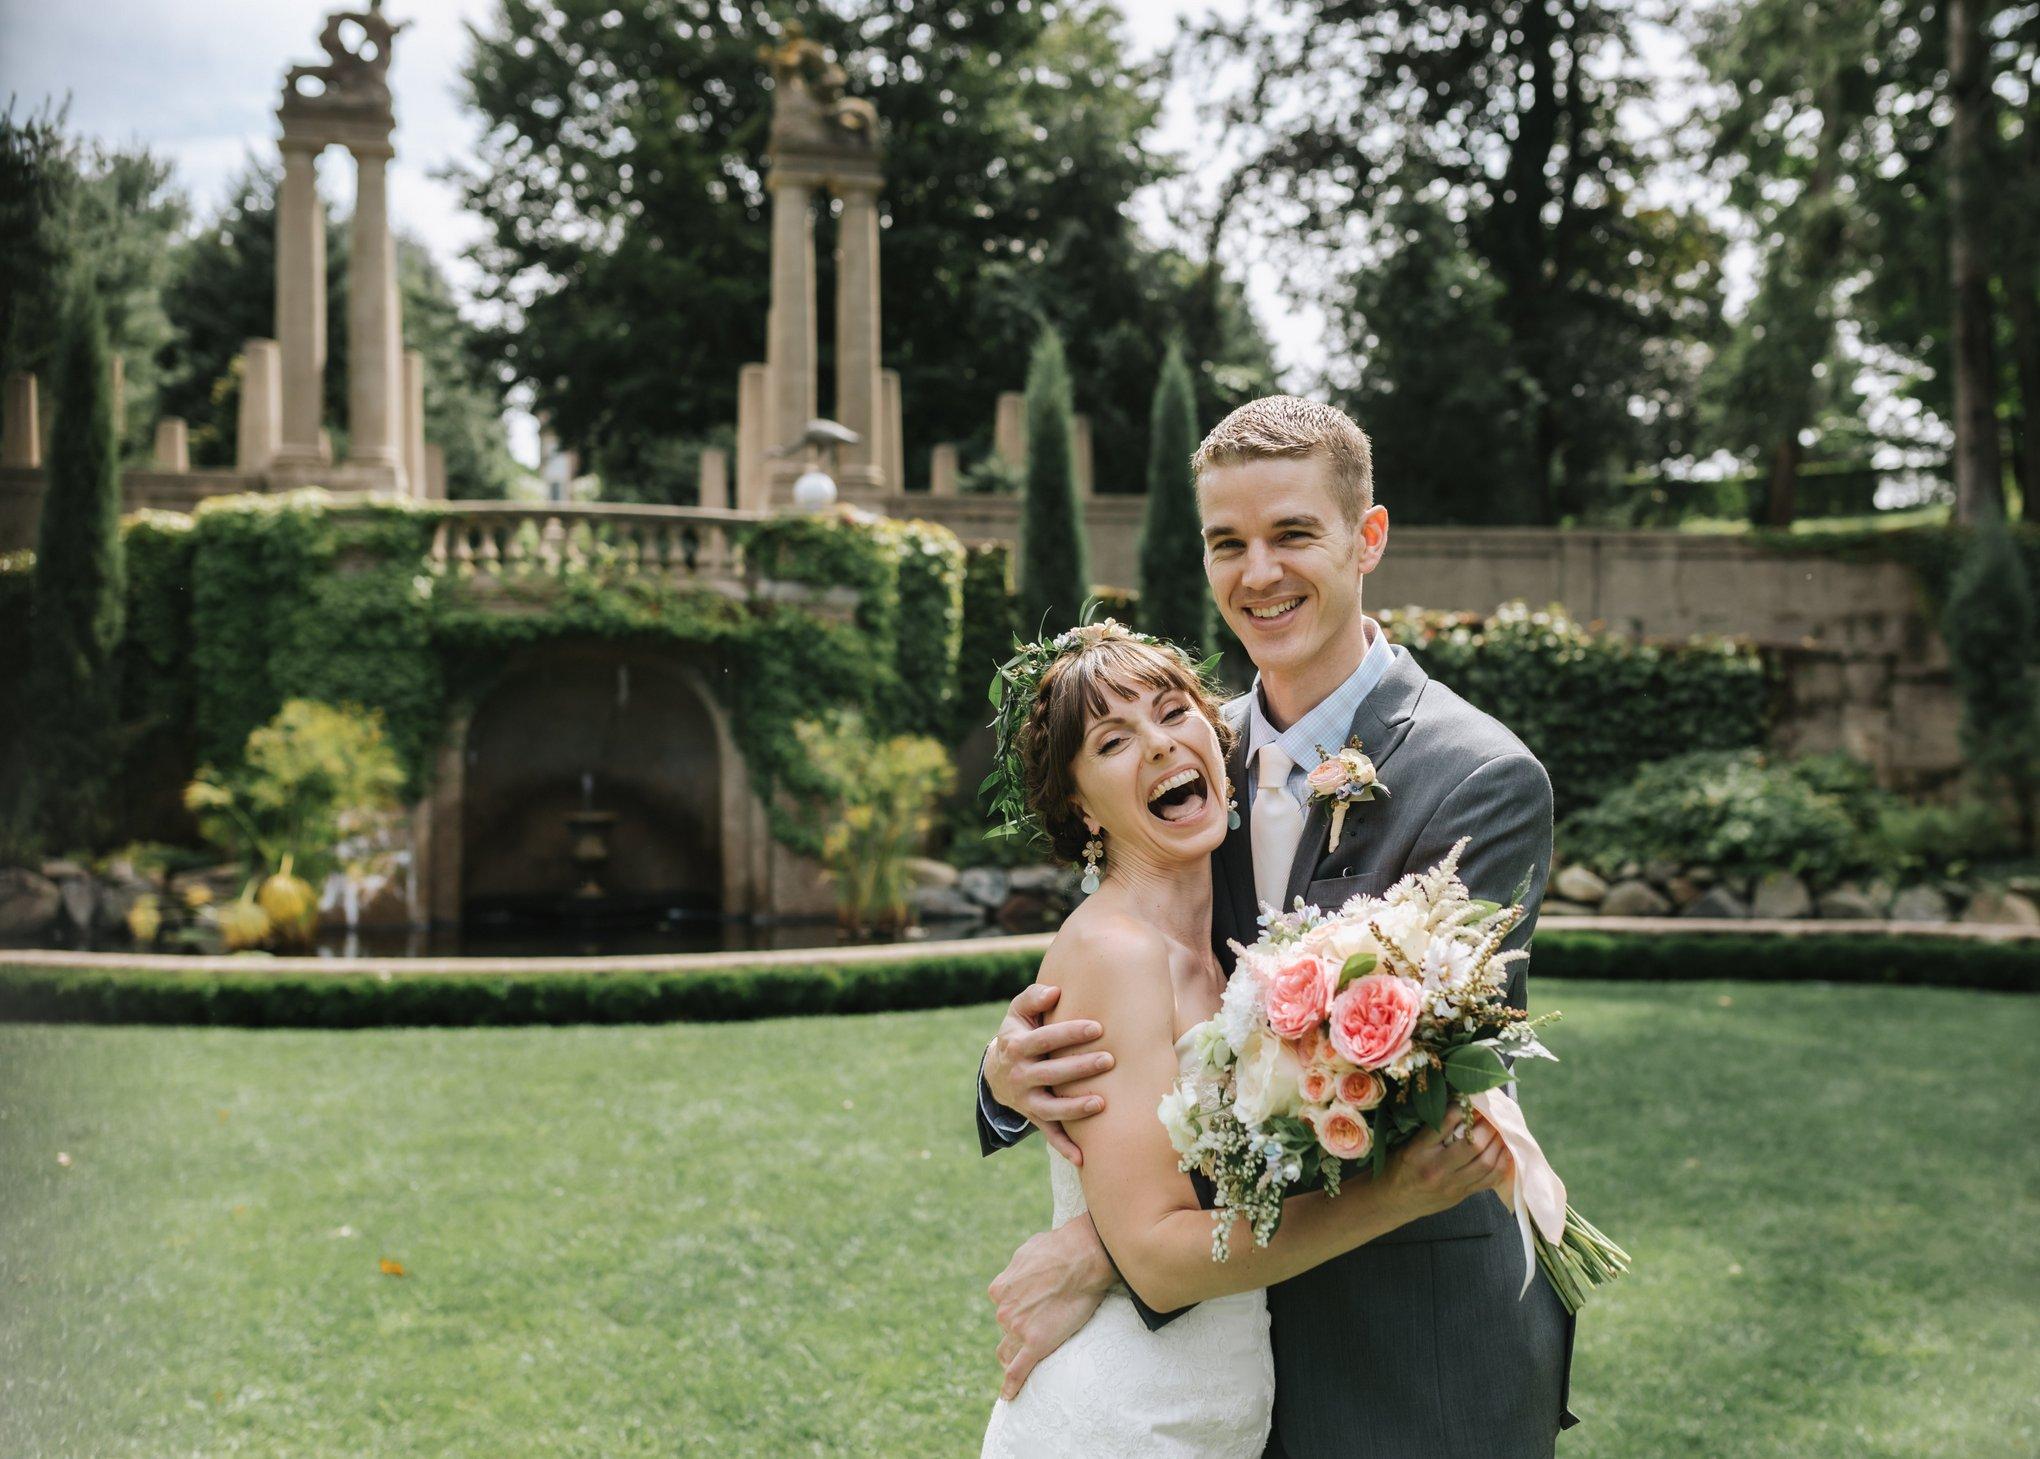 Crane-Estate-Vow-Renewal-Wedding-8.JPG